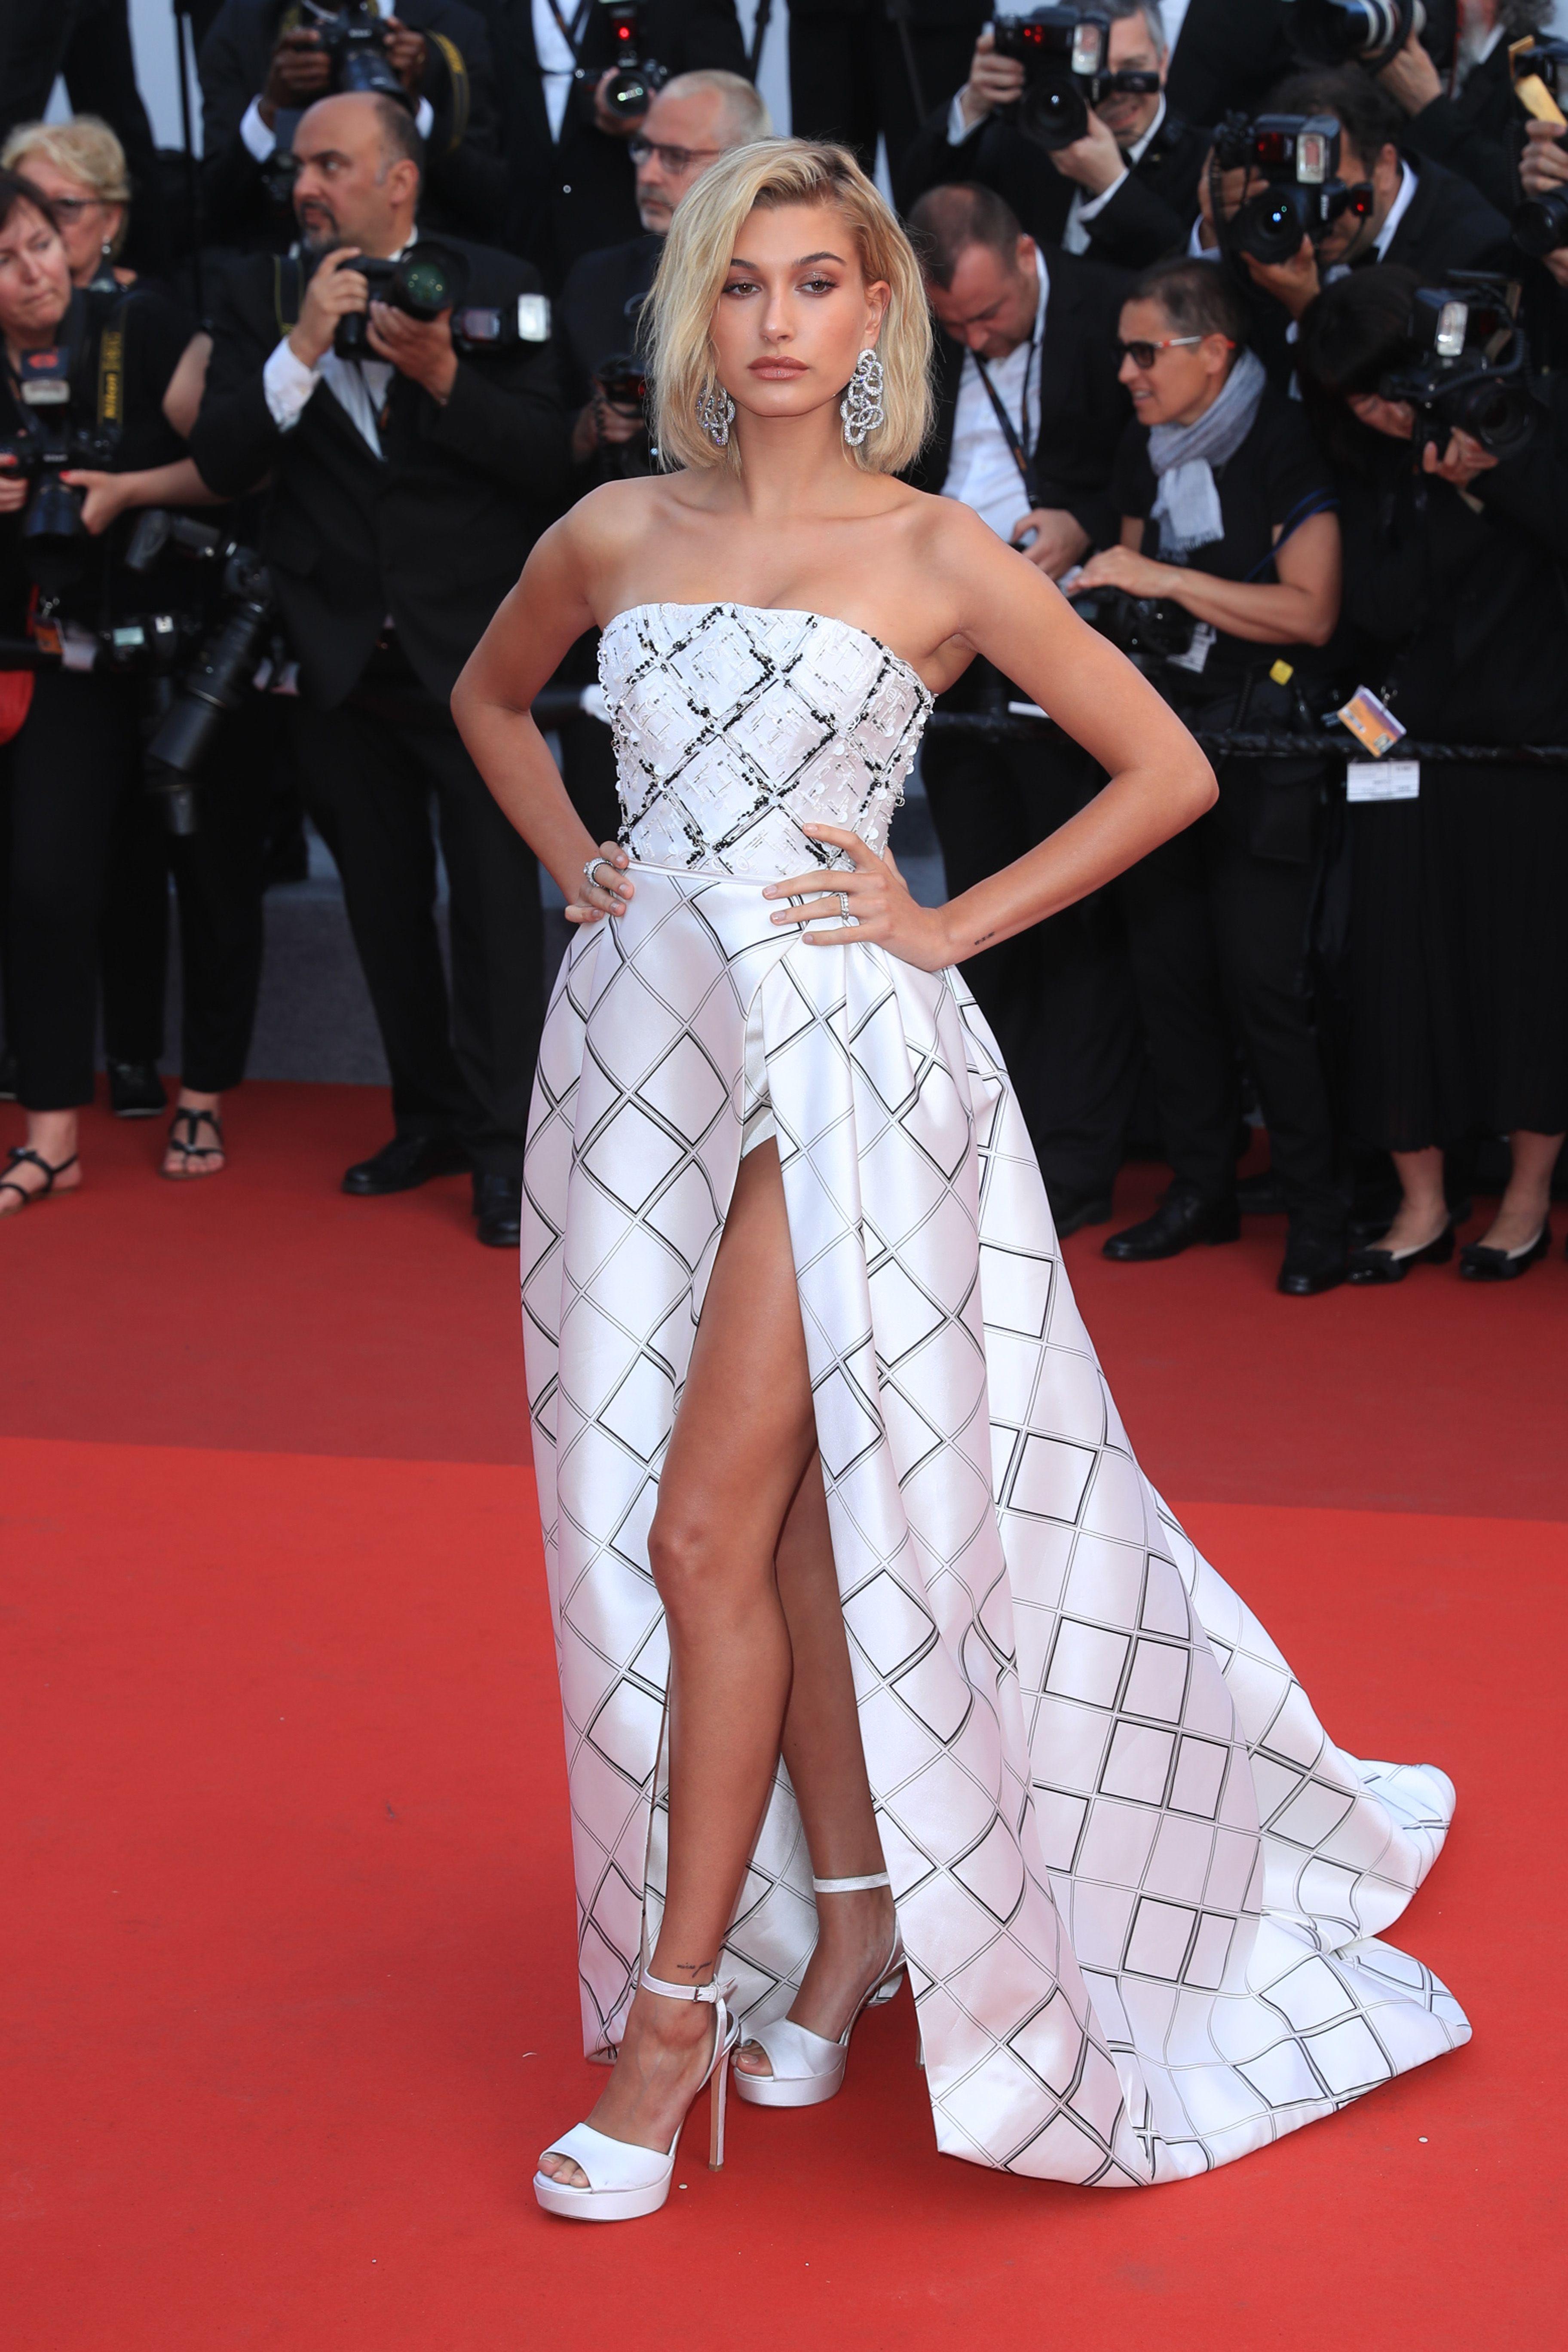 e0bcf74cd48c Festival de Cannes 2017 | Haute Couture. | Hailey baldwin style ...